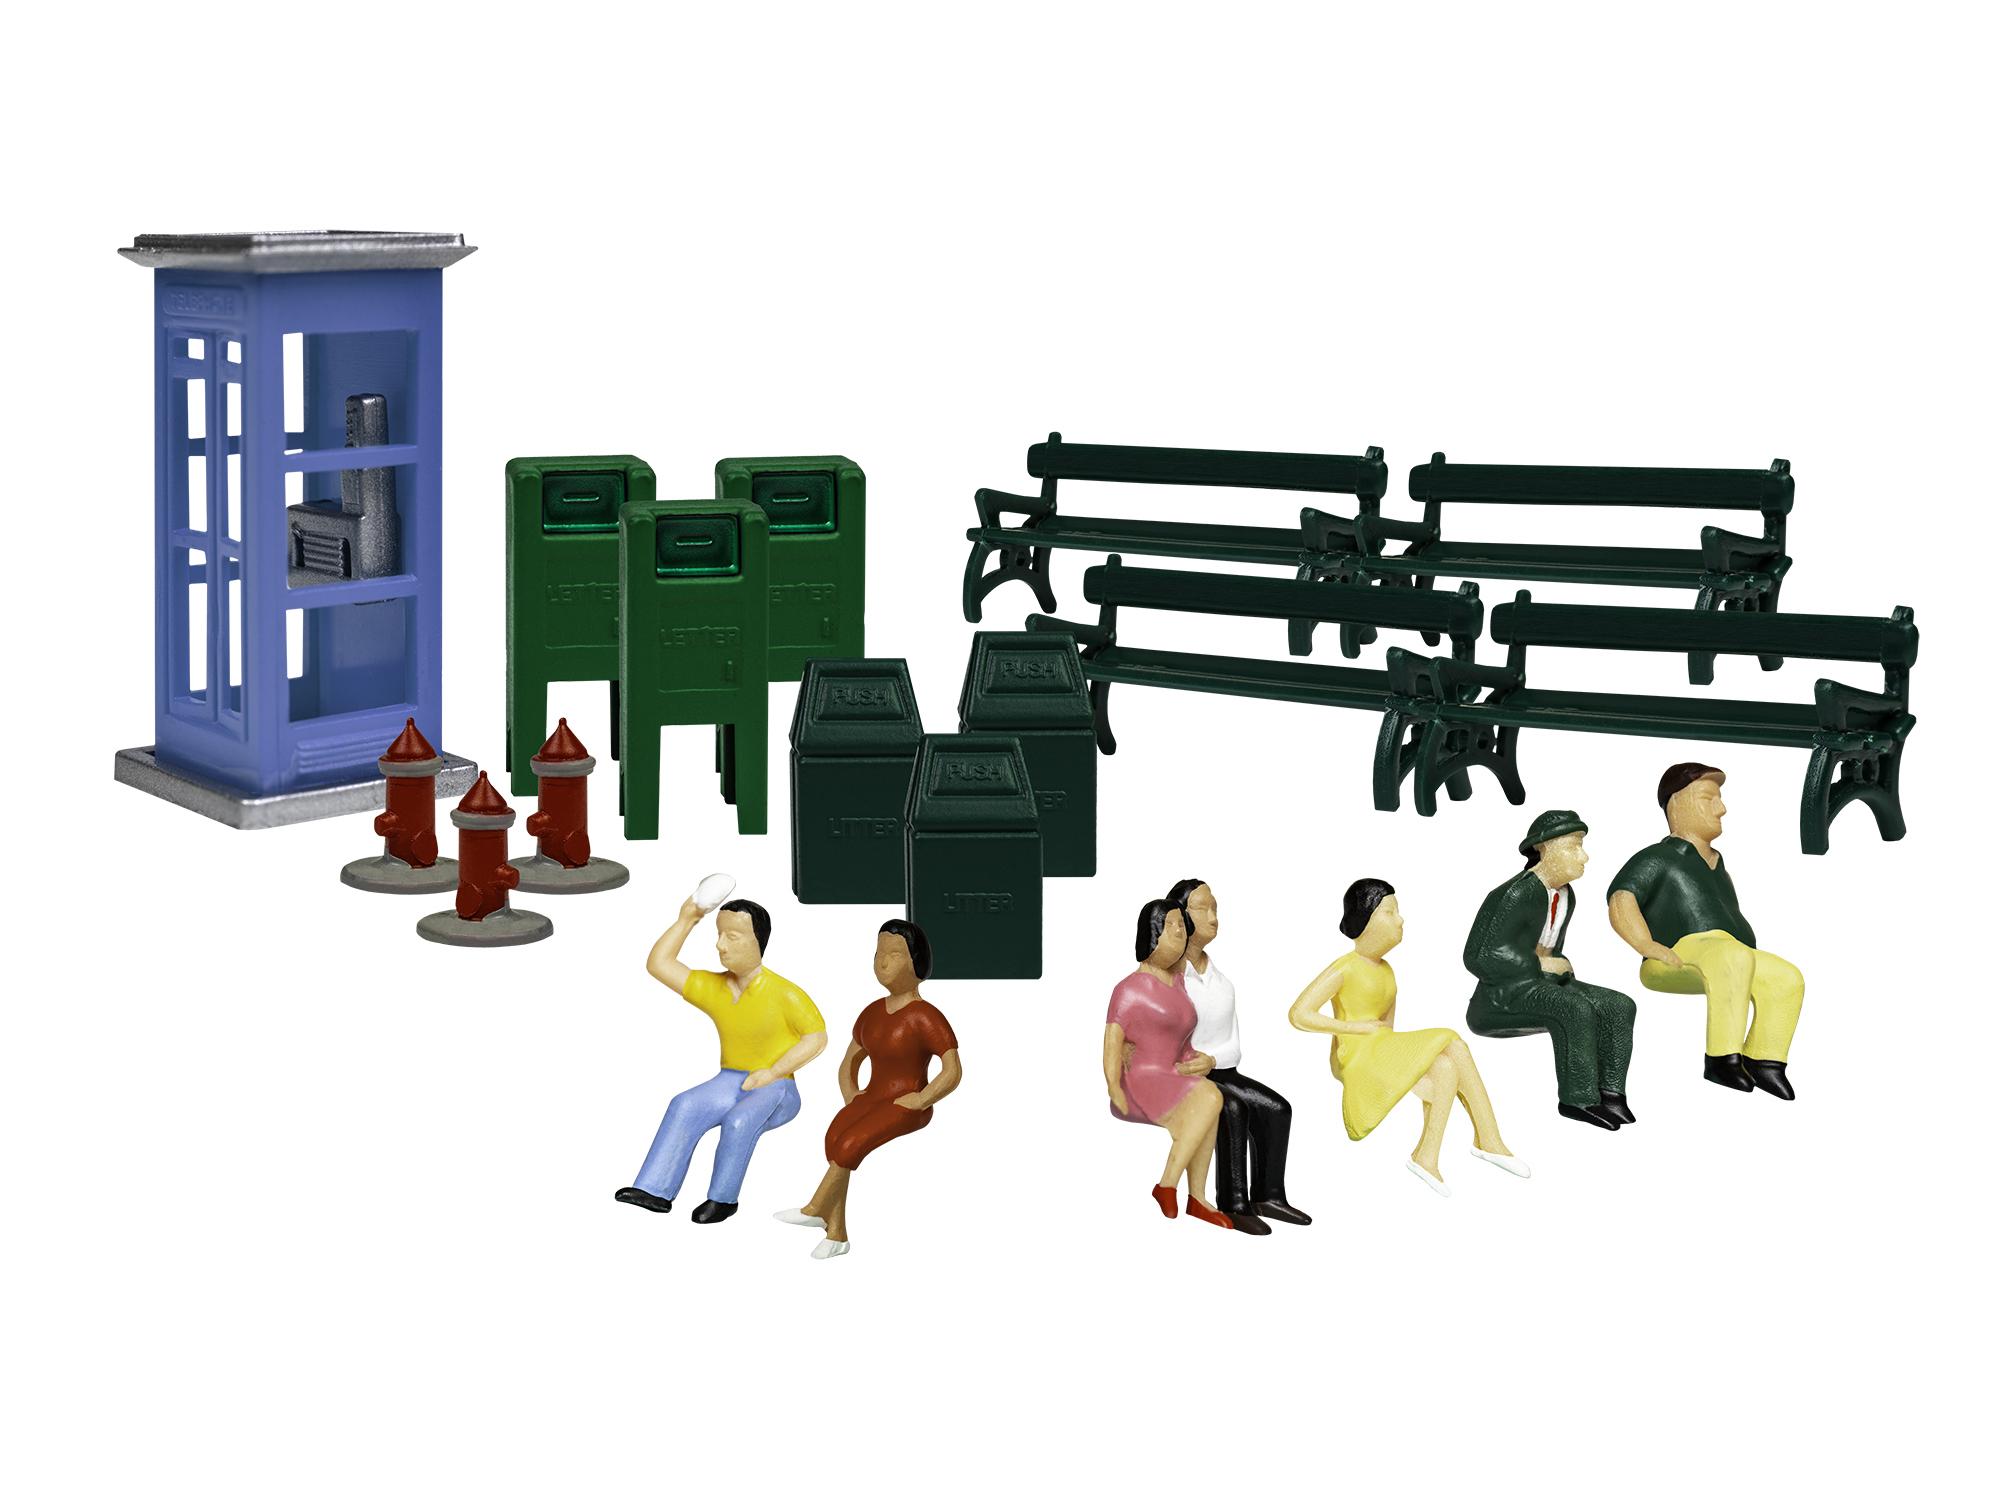 Lionel 1957260 HO Sidewalk Scenes 6 People w/ Accessories